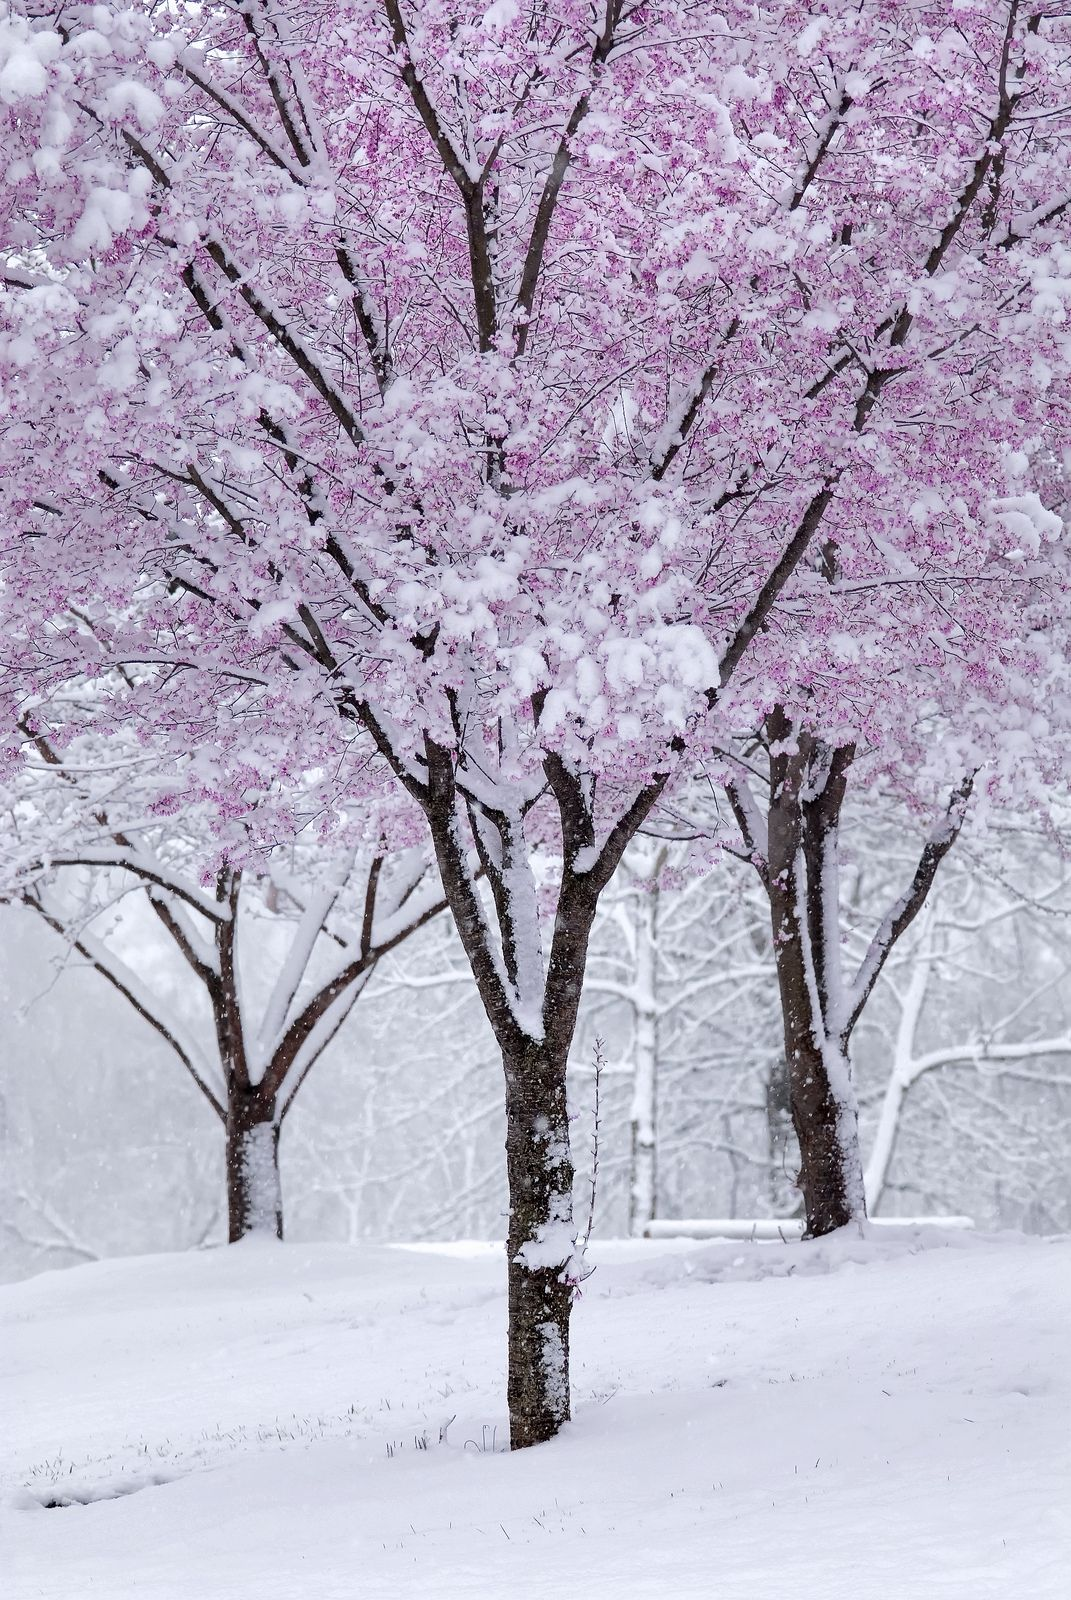 Spring Snow Winter Nature Spring Snow Blossom Trees